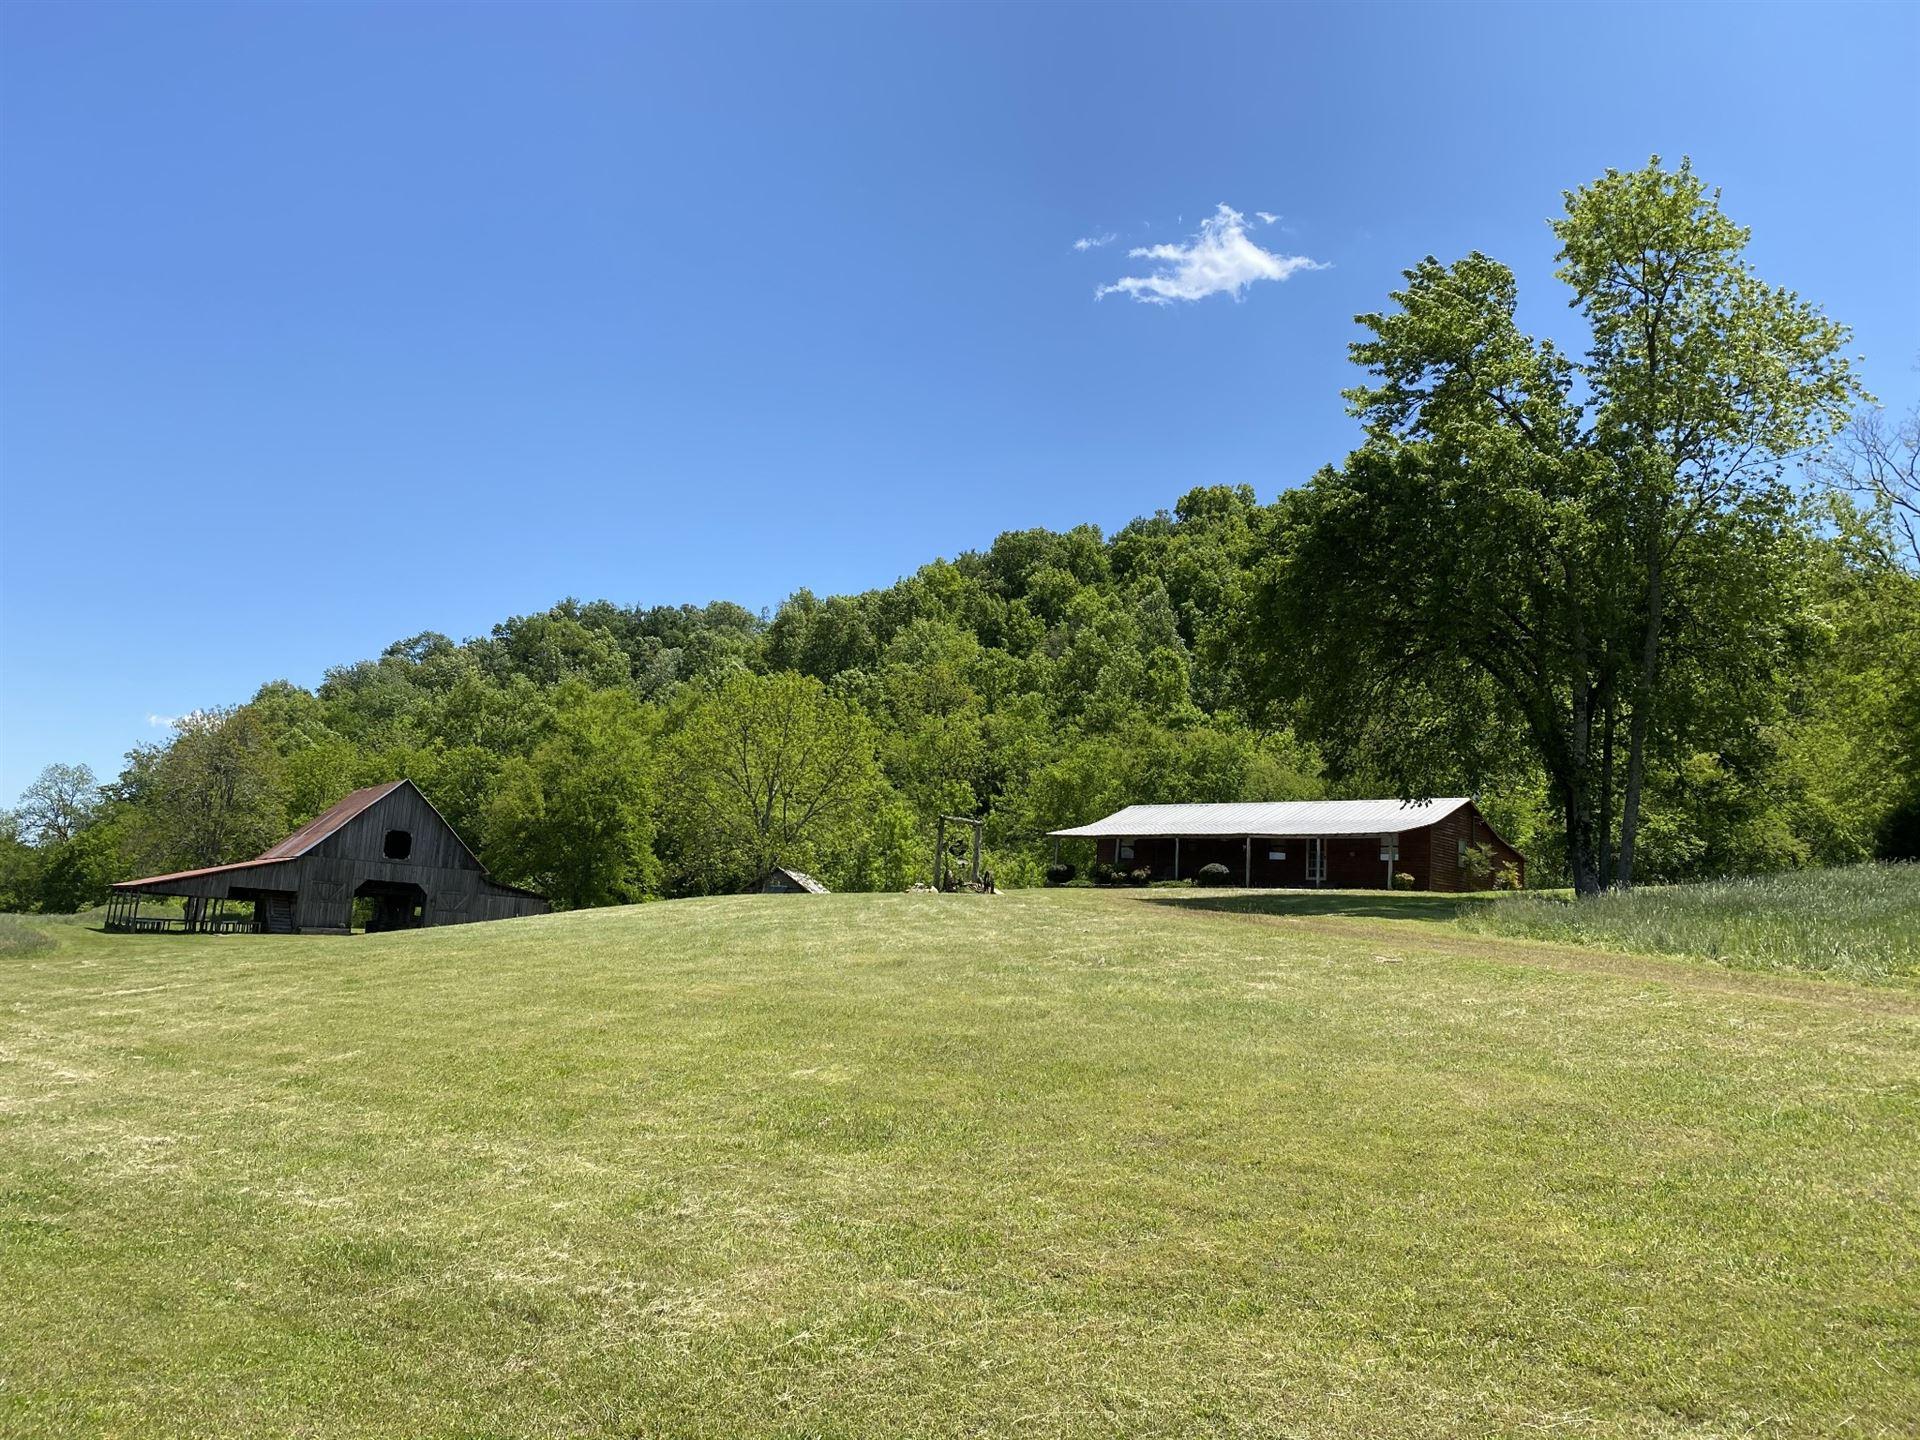 Photo of 450 Pete White Rd, Lawrenceburg, TN 38464 (MLS # 2148695)